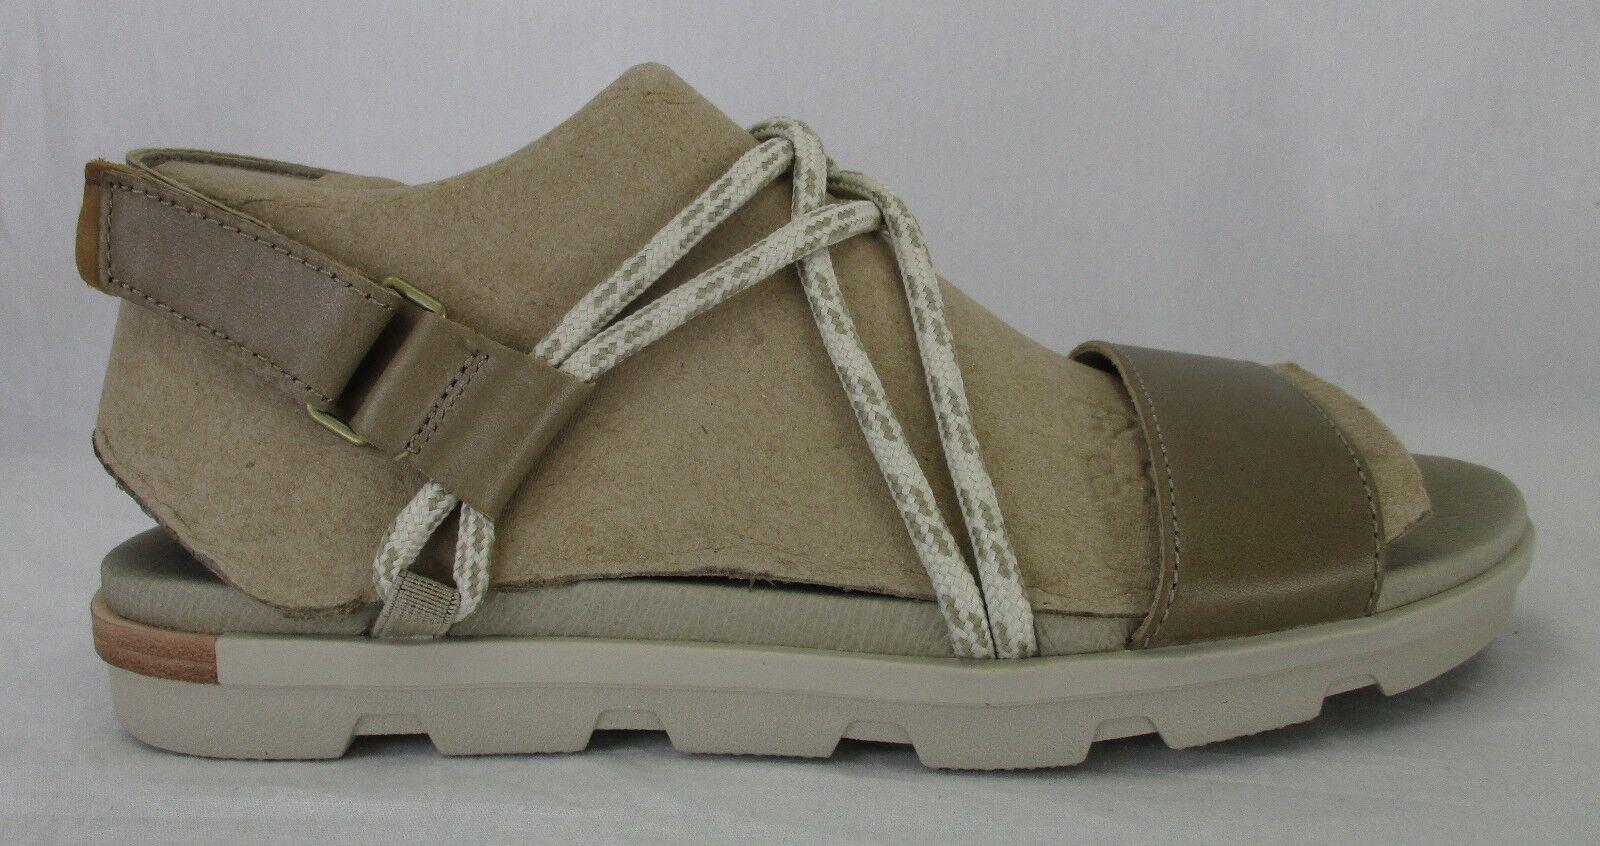 Sorel Donna Torpeda II Sandals 1776241 Sandy Tan Size 8